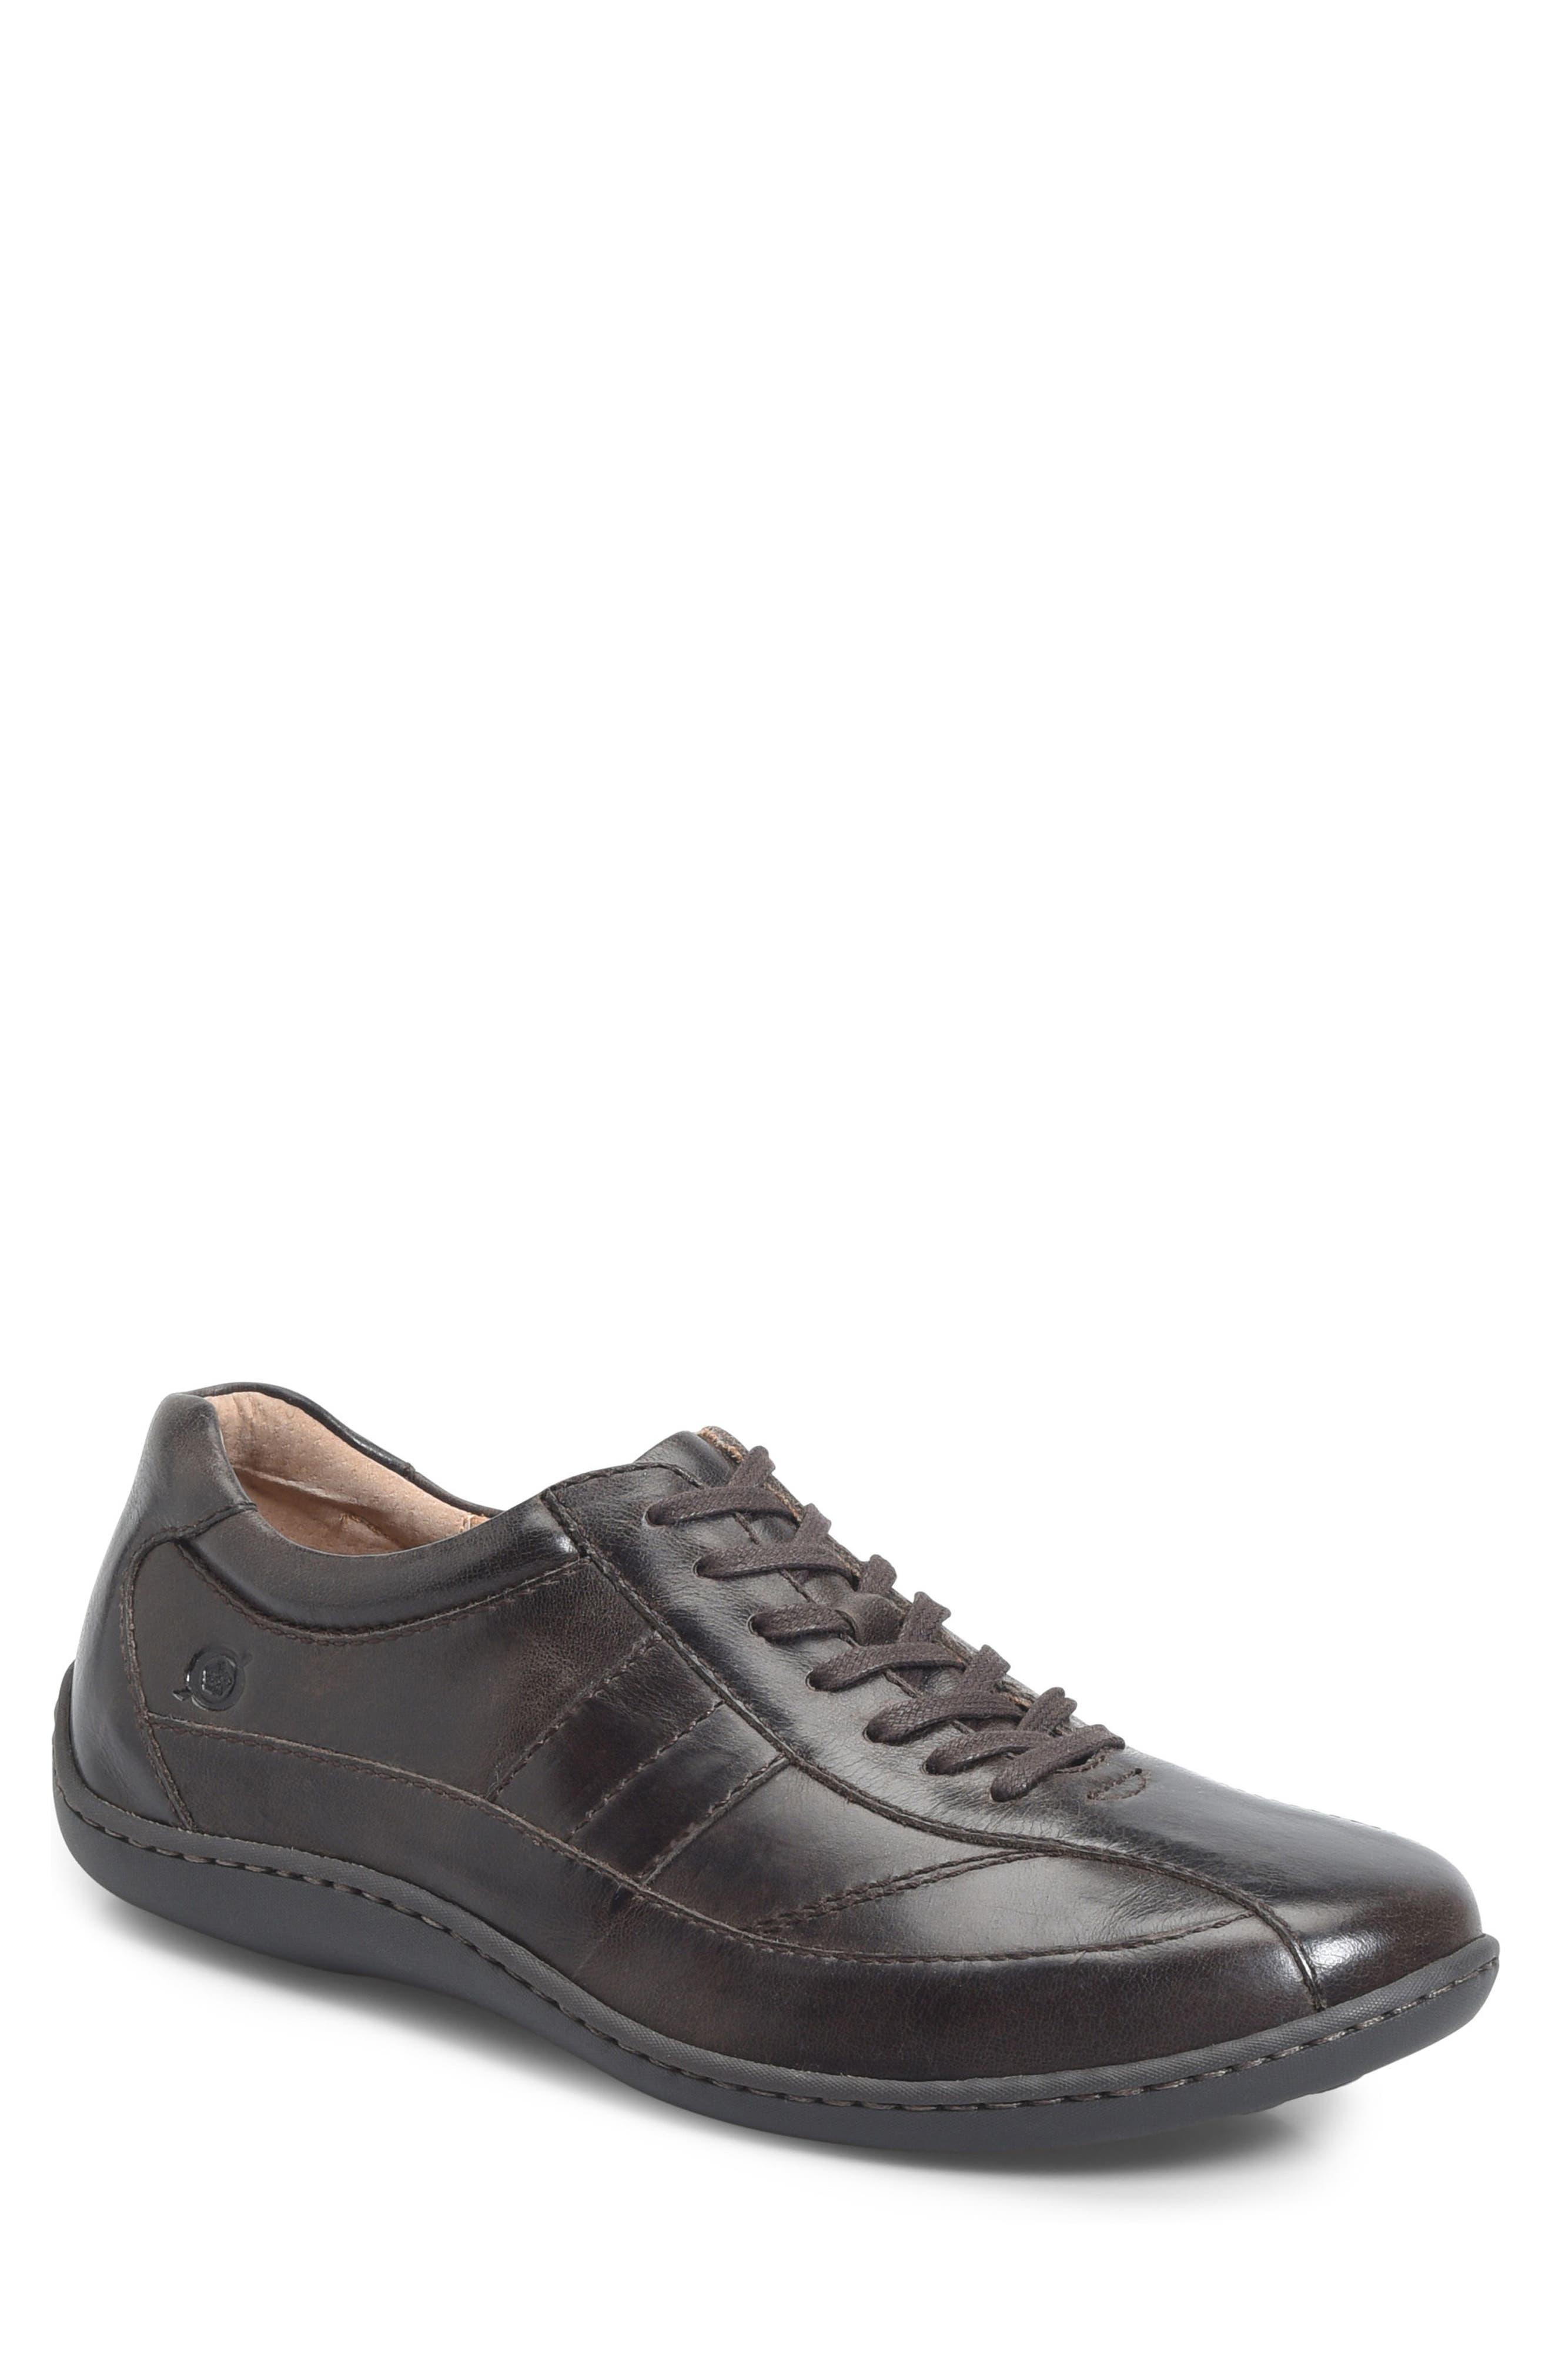 Breves Low Top Sneaker,                         Main,                         color, Dark Brown Distressed